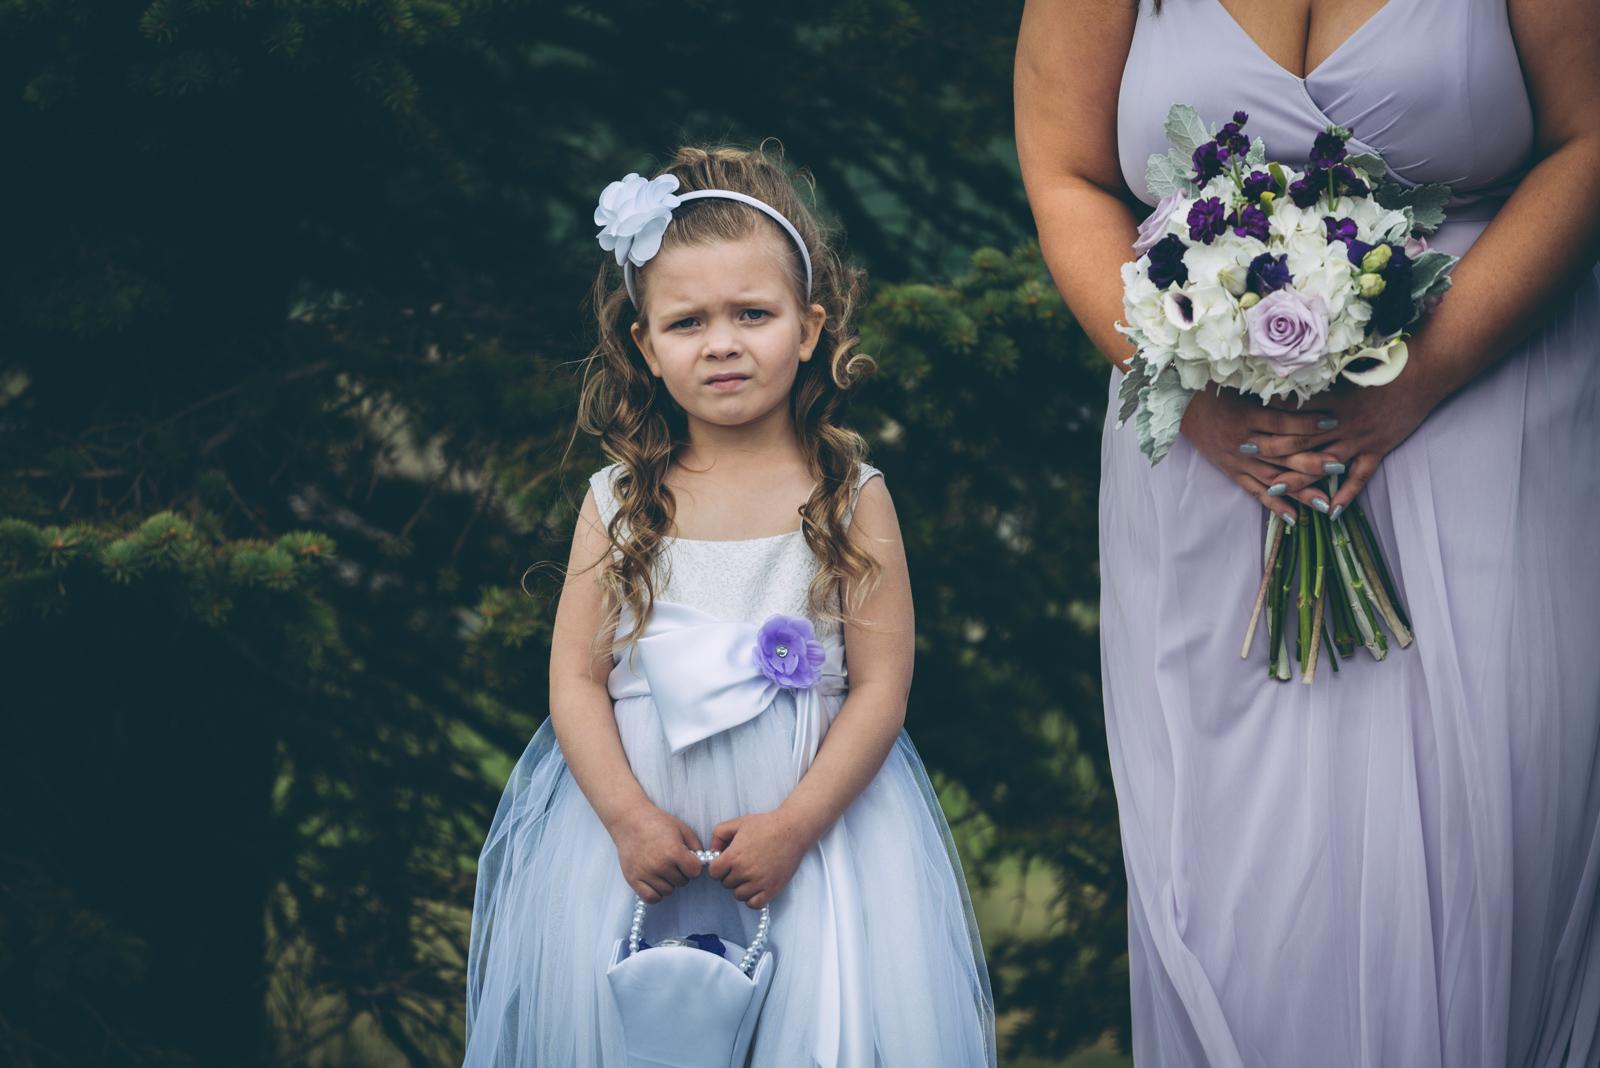 top-wedding-photos-2018-blog-2.jpg